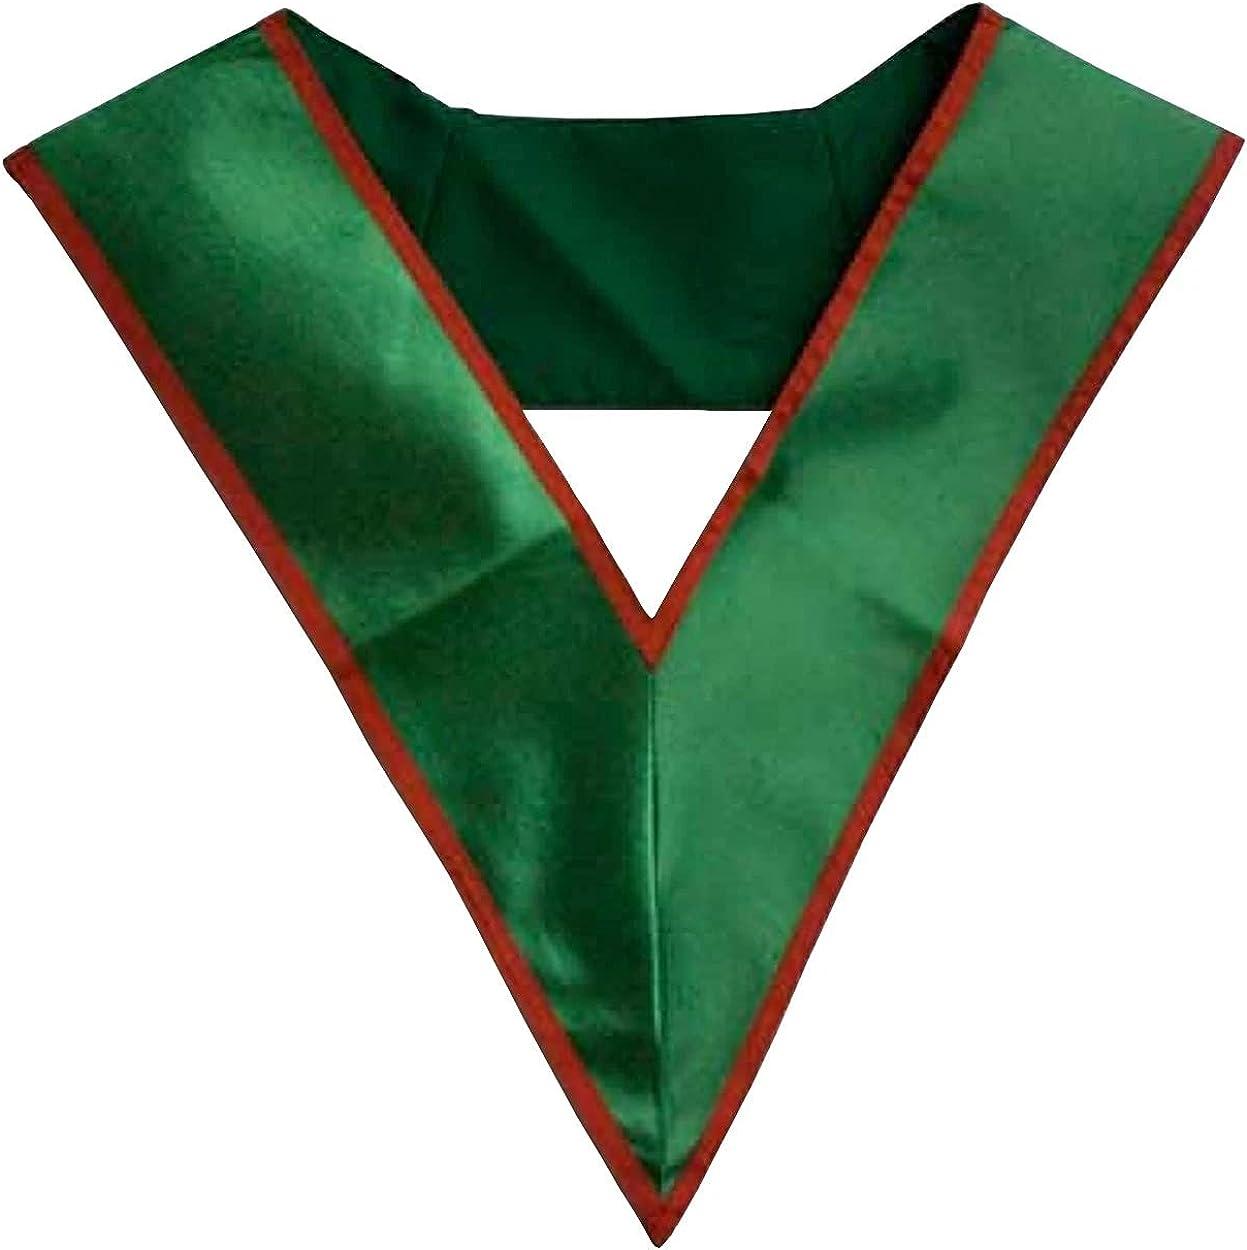 Masonic Officer's collar - ASSR - 29th degree